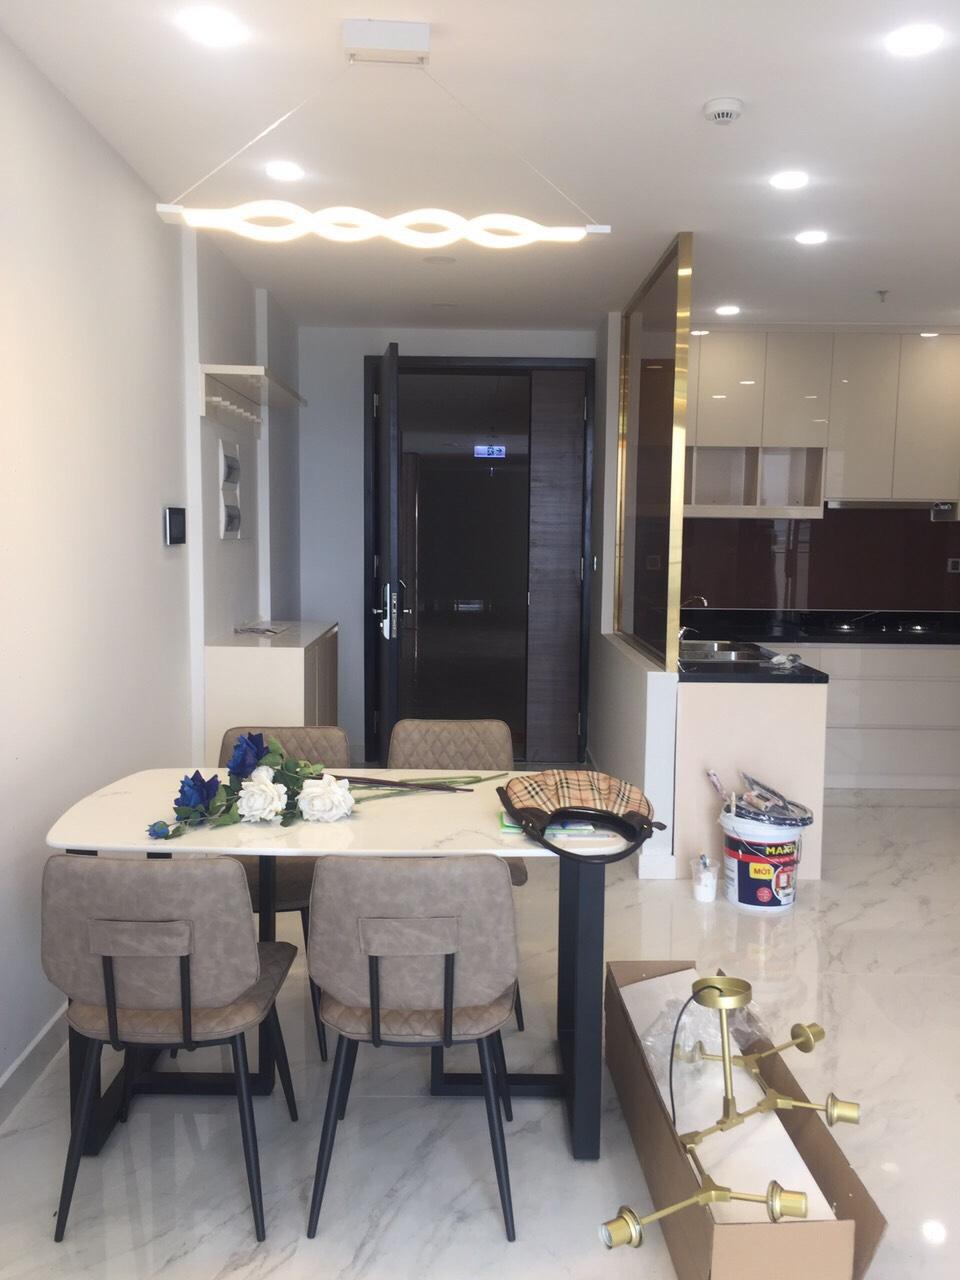 midtown-sakura-for-rent